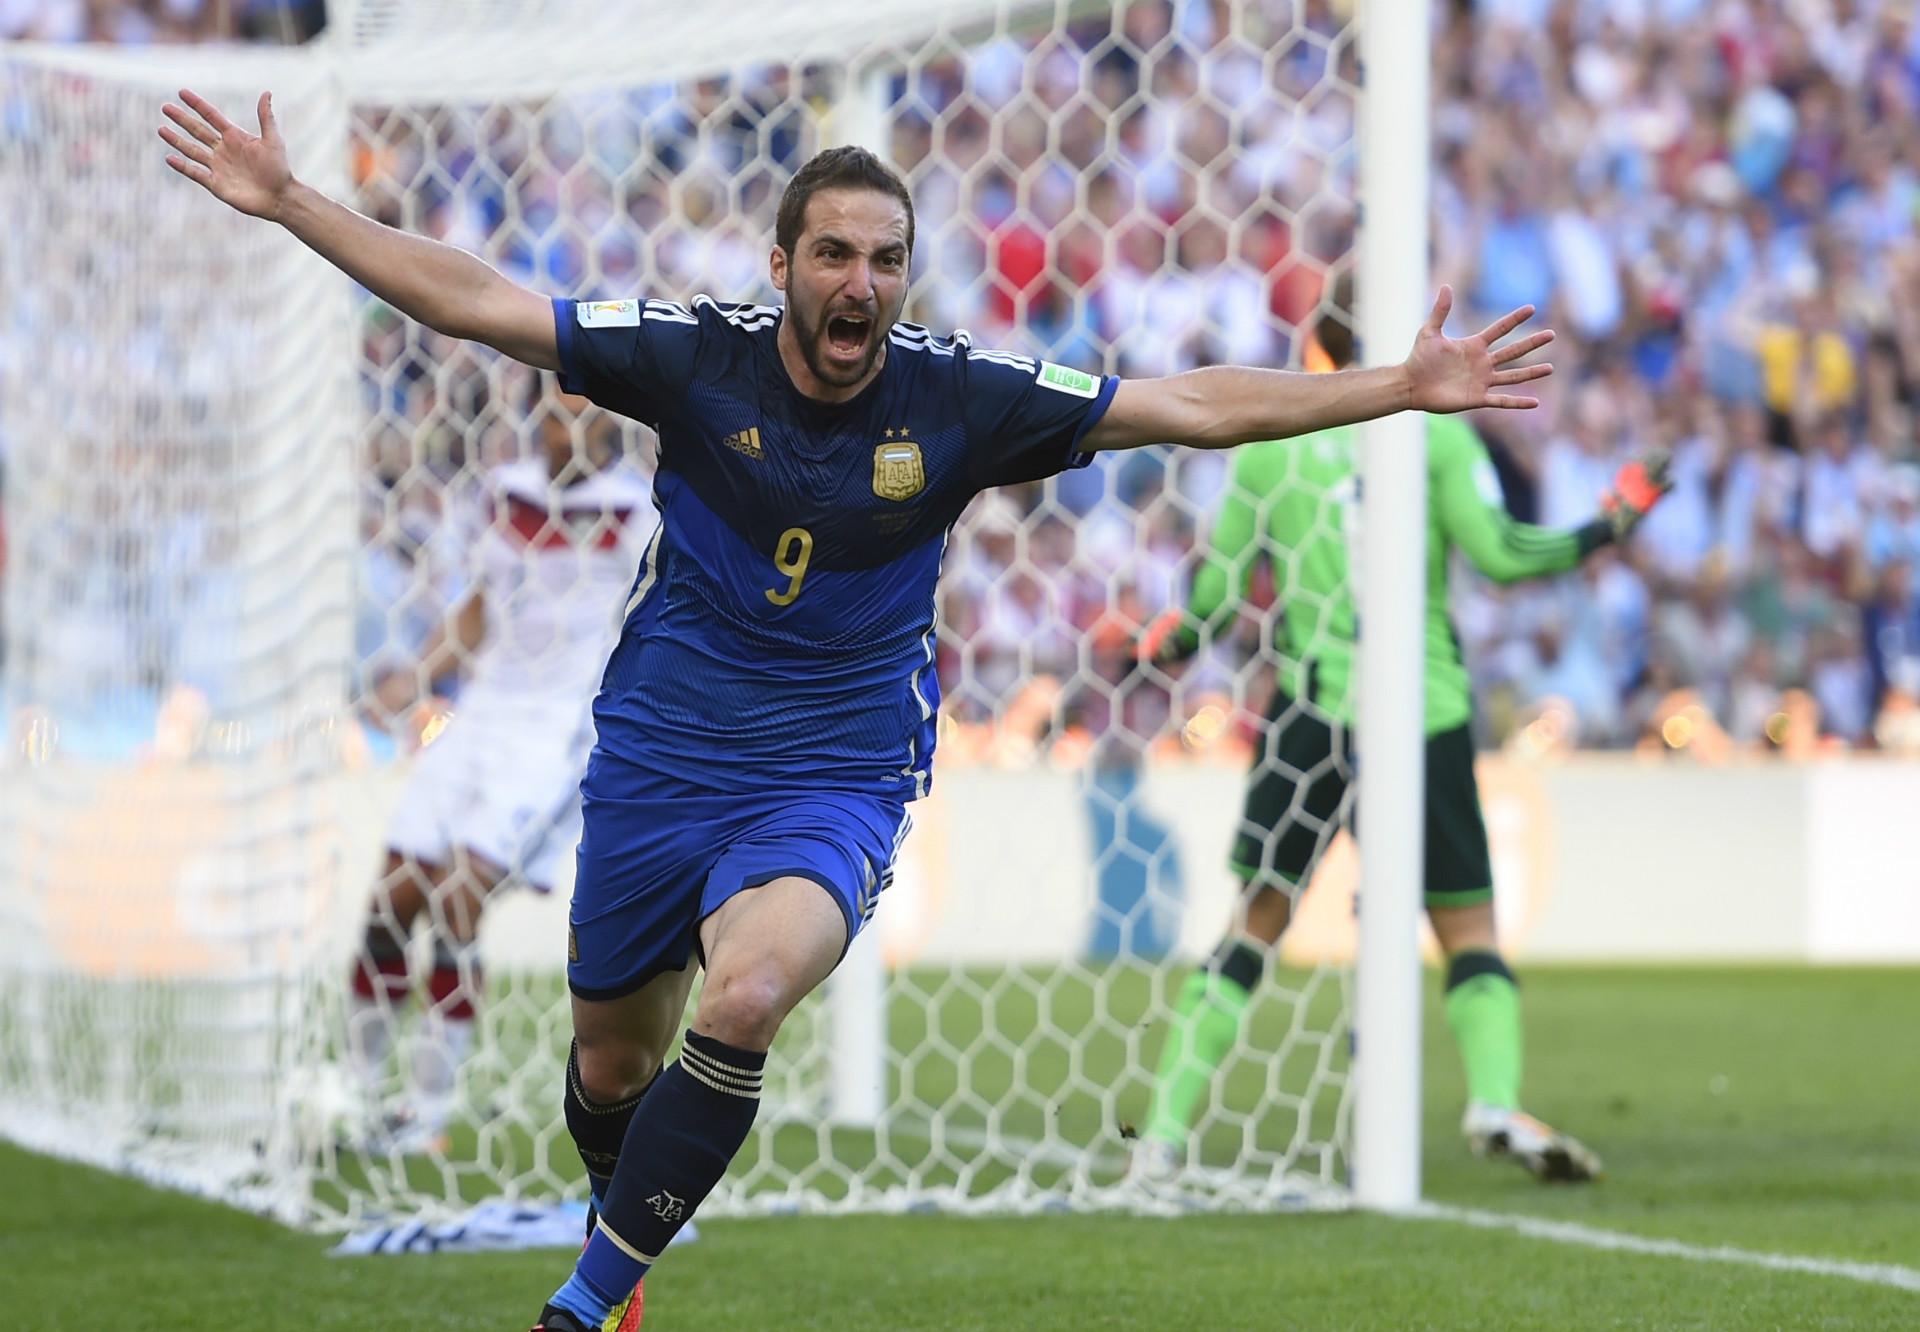 GONZALO HIGUAIN ARGENTINA 2014 WORLD CUP FINAL 07132014